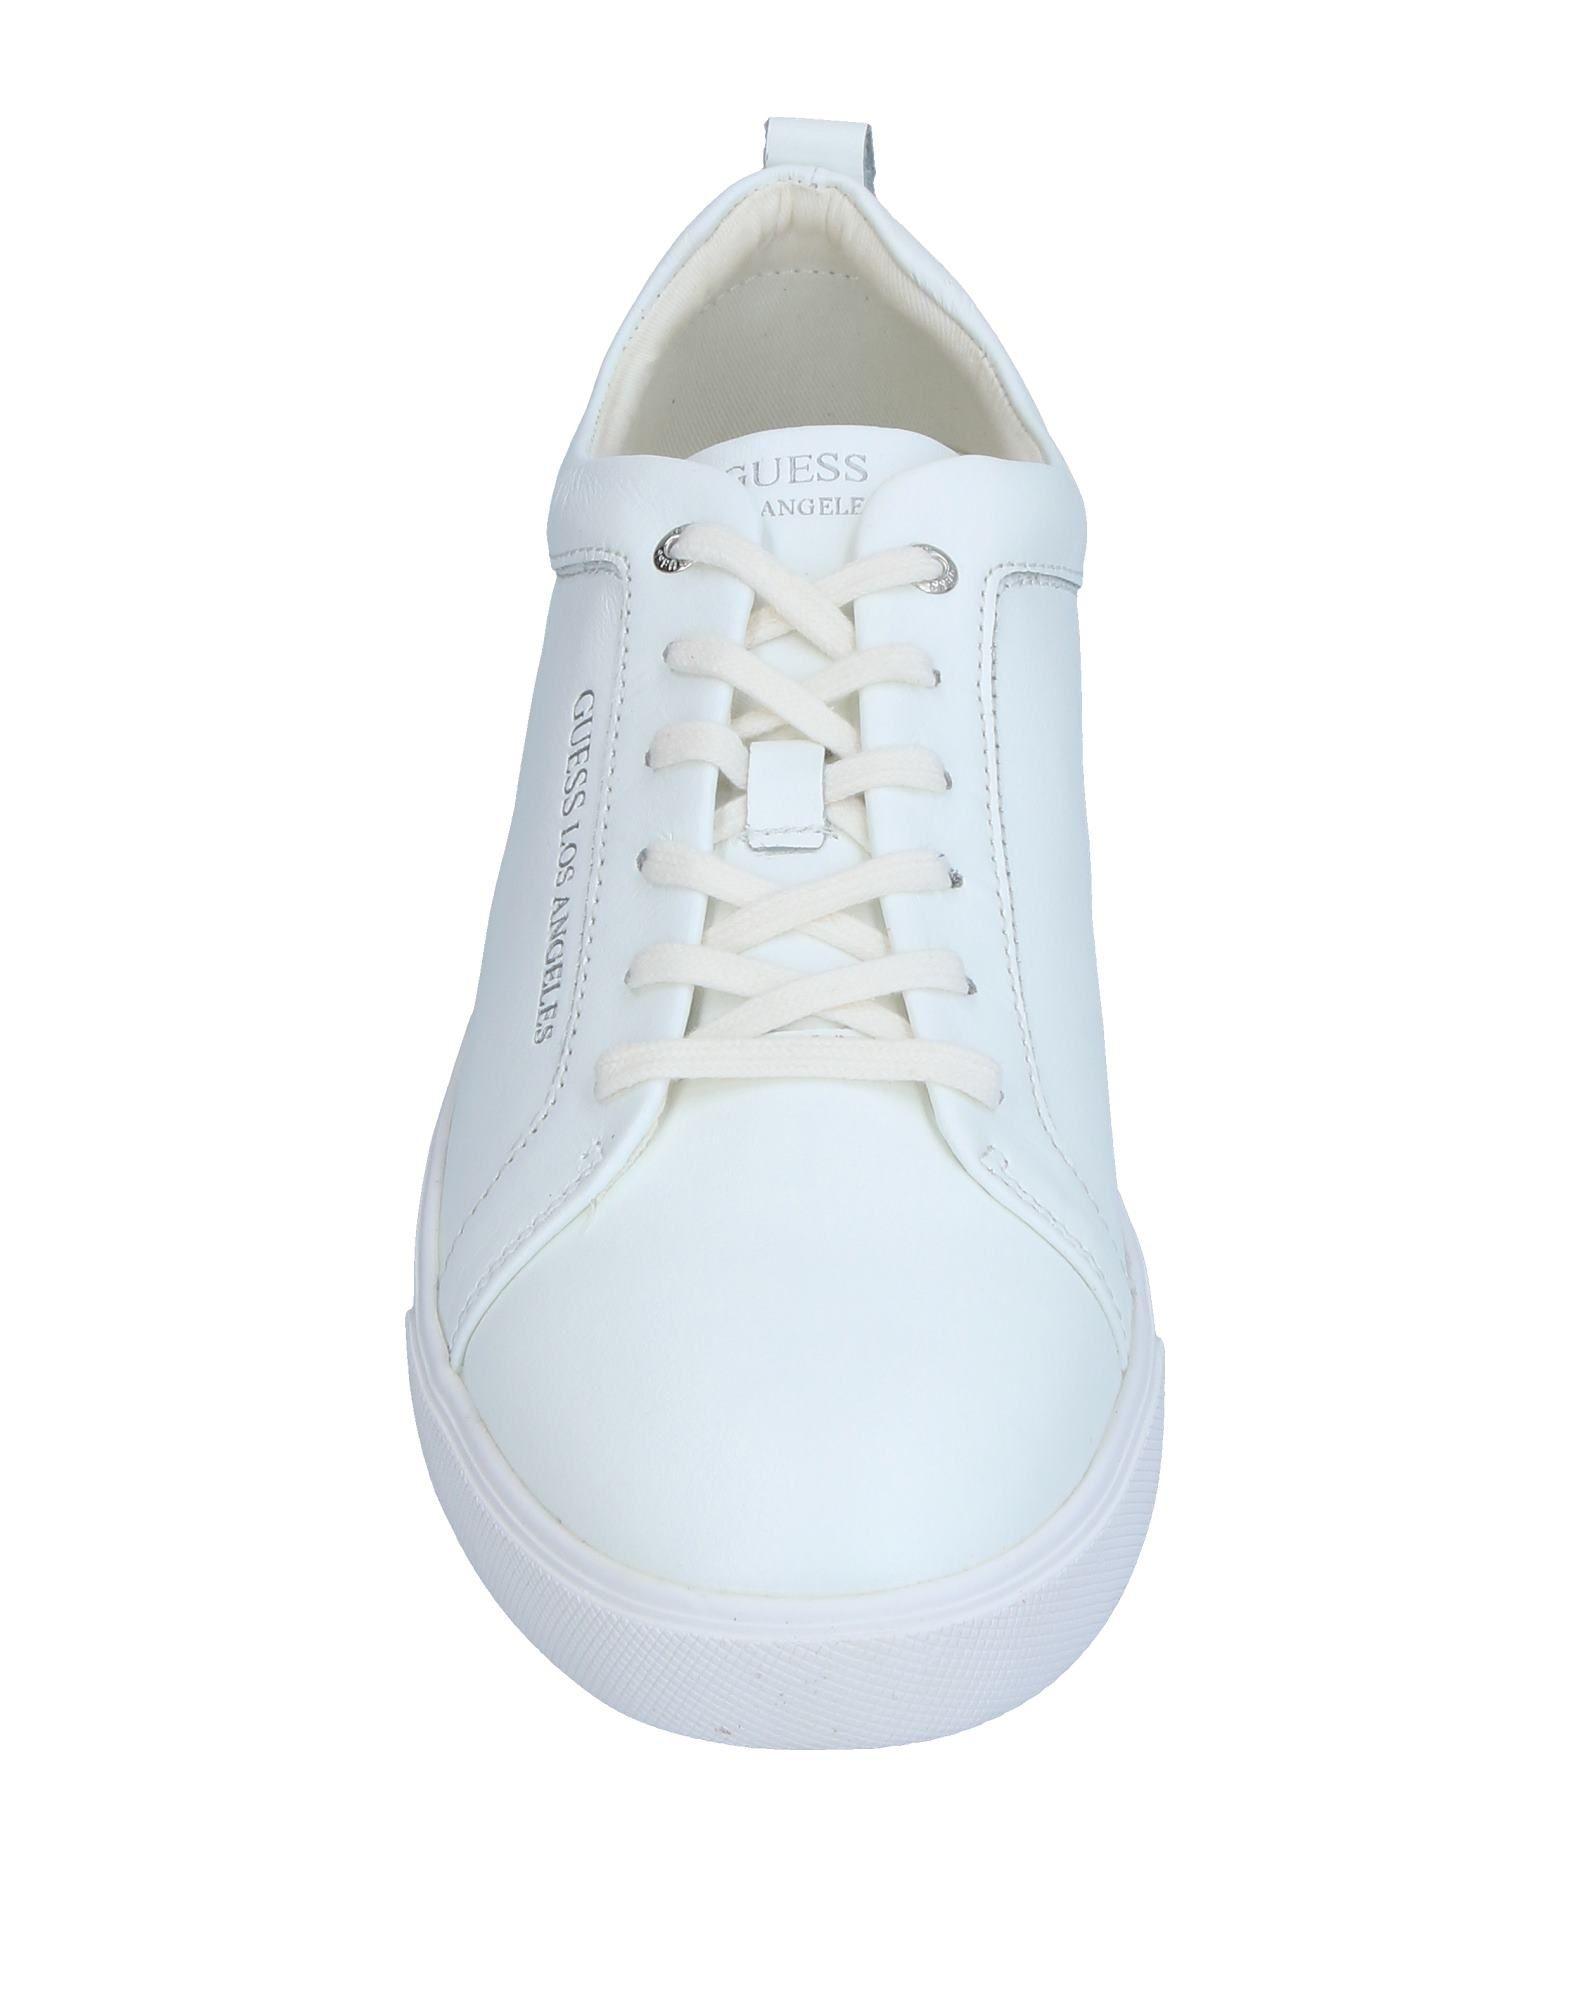 Heiße Guess Sneakers Herren  11329644CL Heiße  Schuhe 715e14